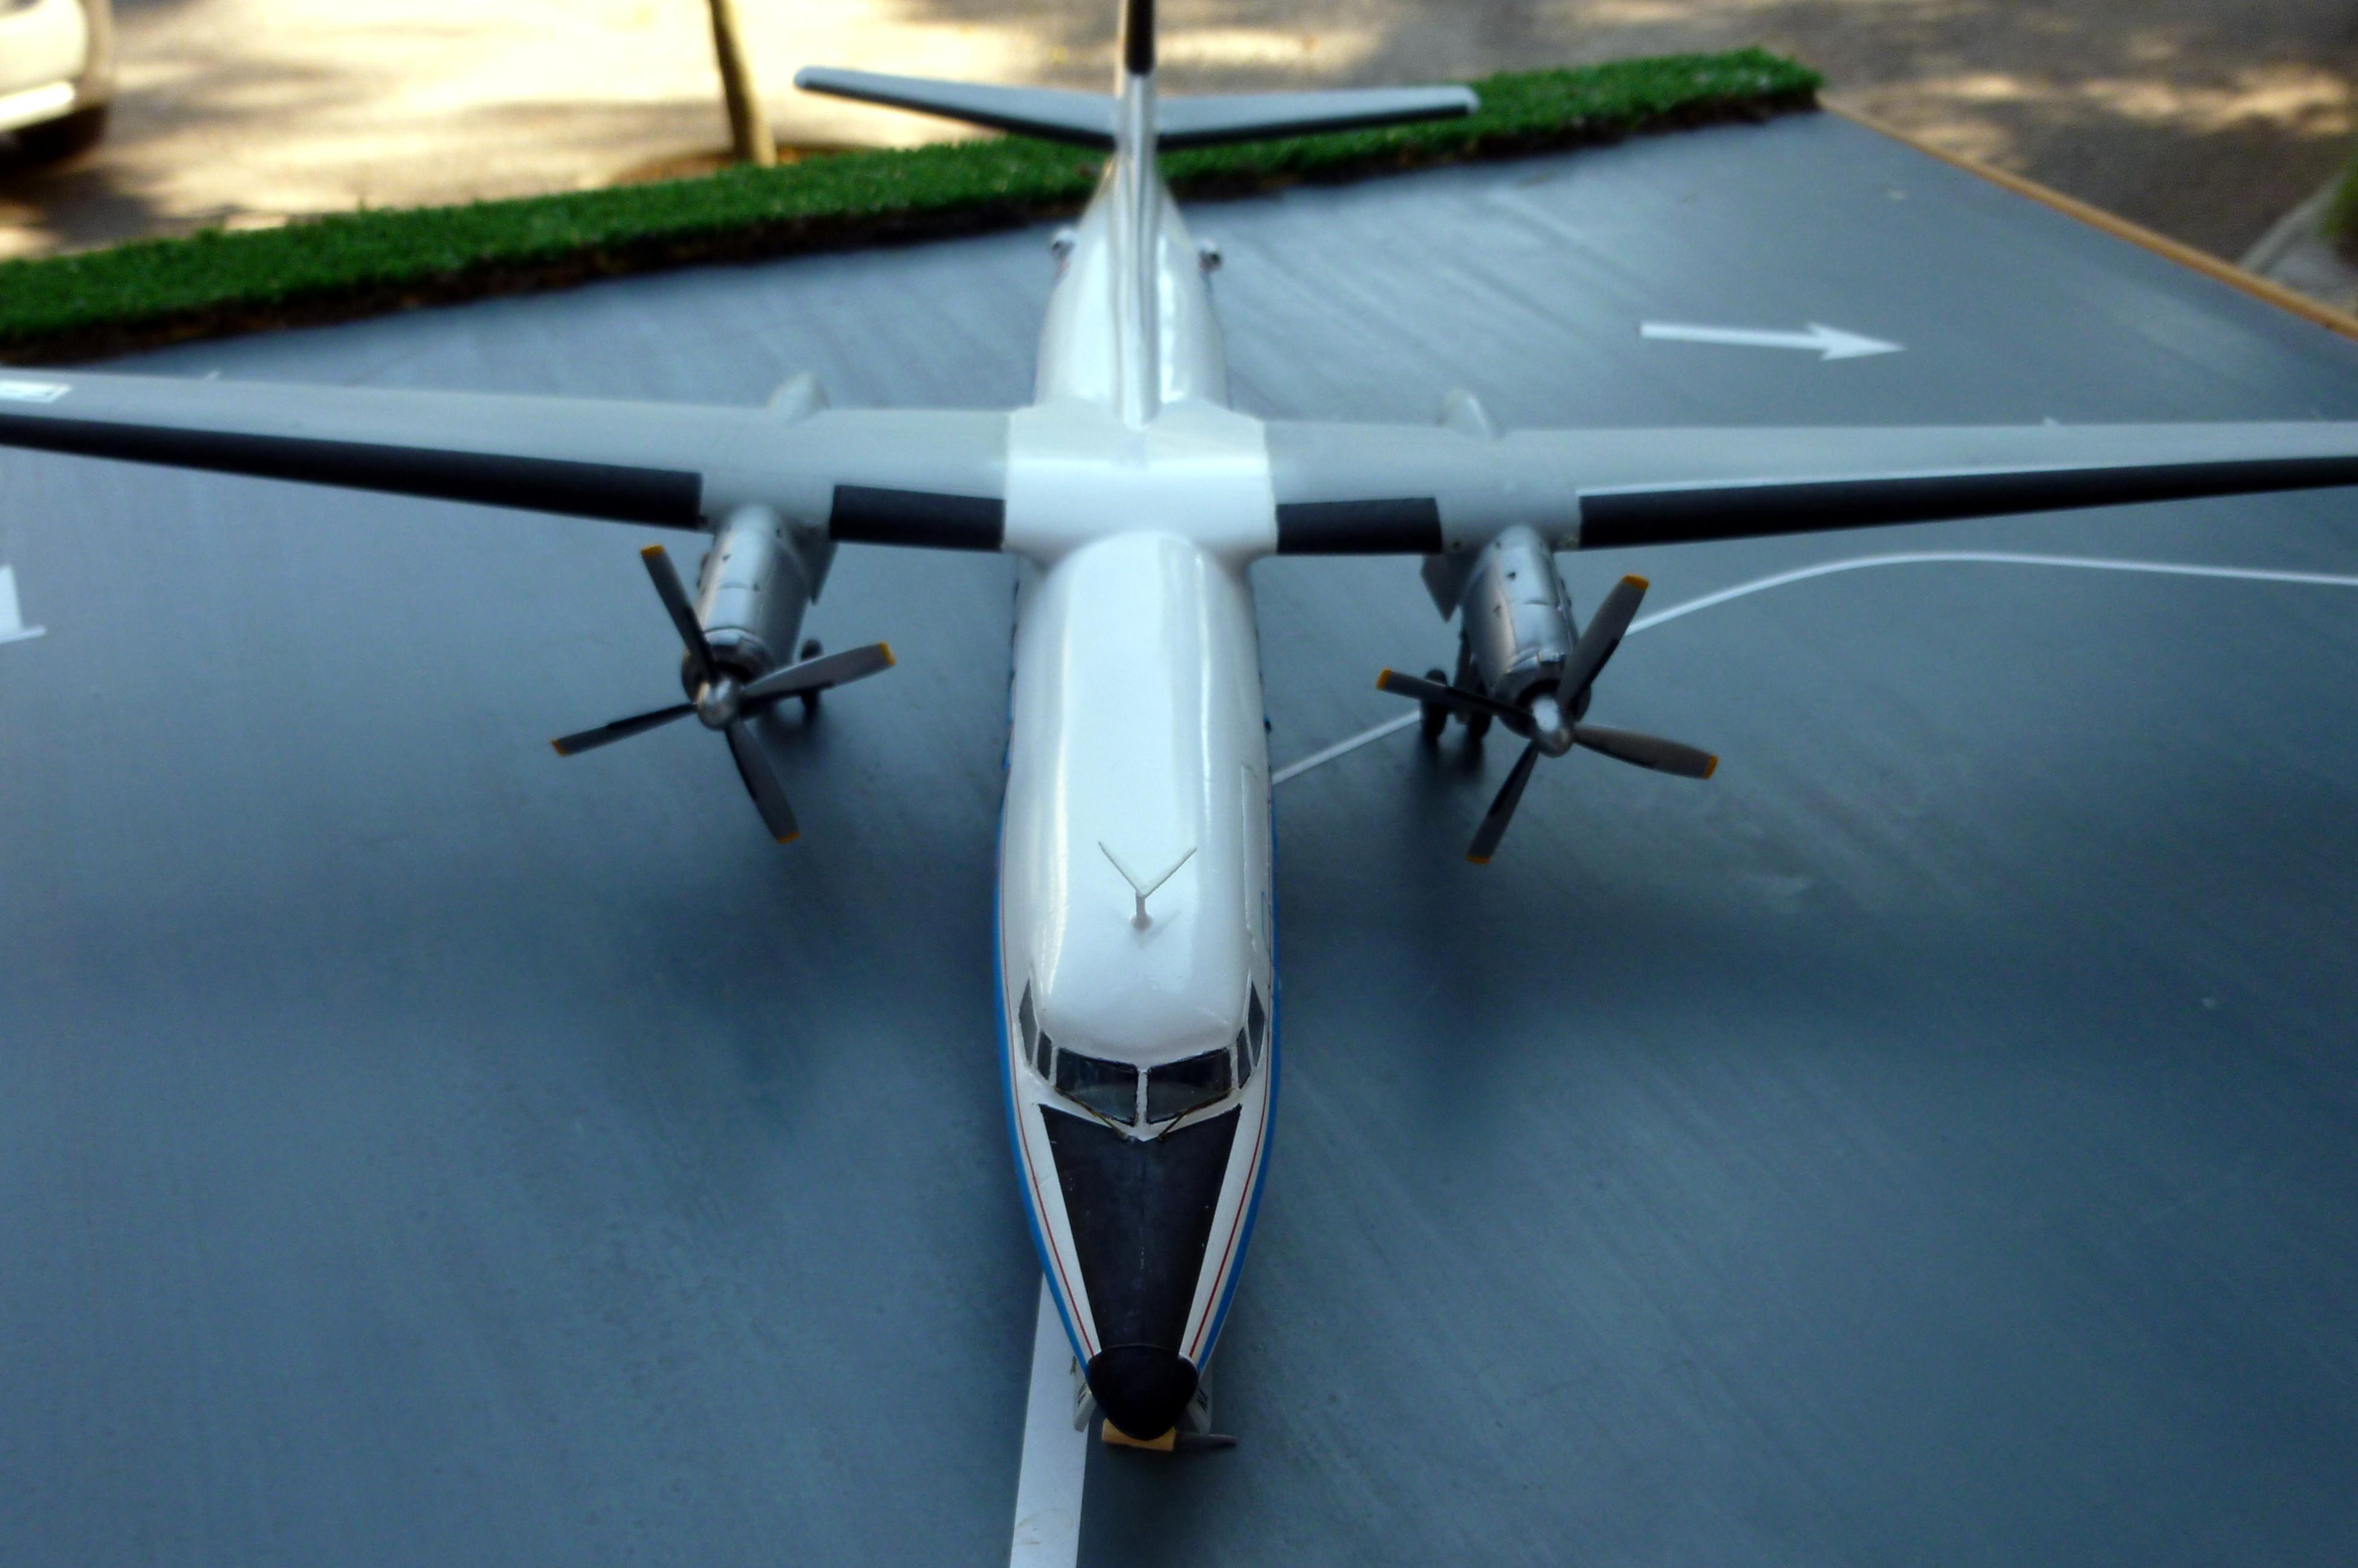 Fokker F 27-500  ESCI 1/72 scale - Page 2 18091105565821371115887935